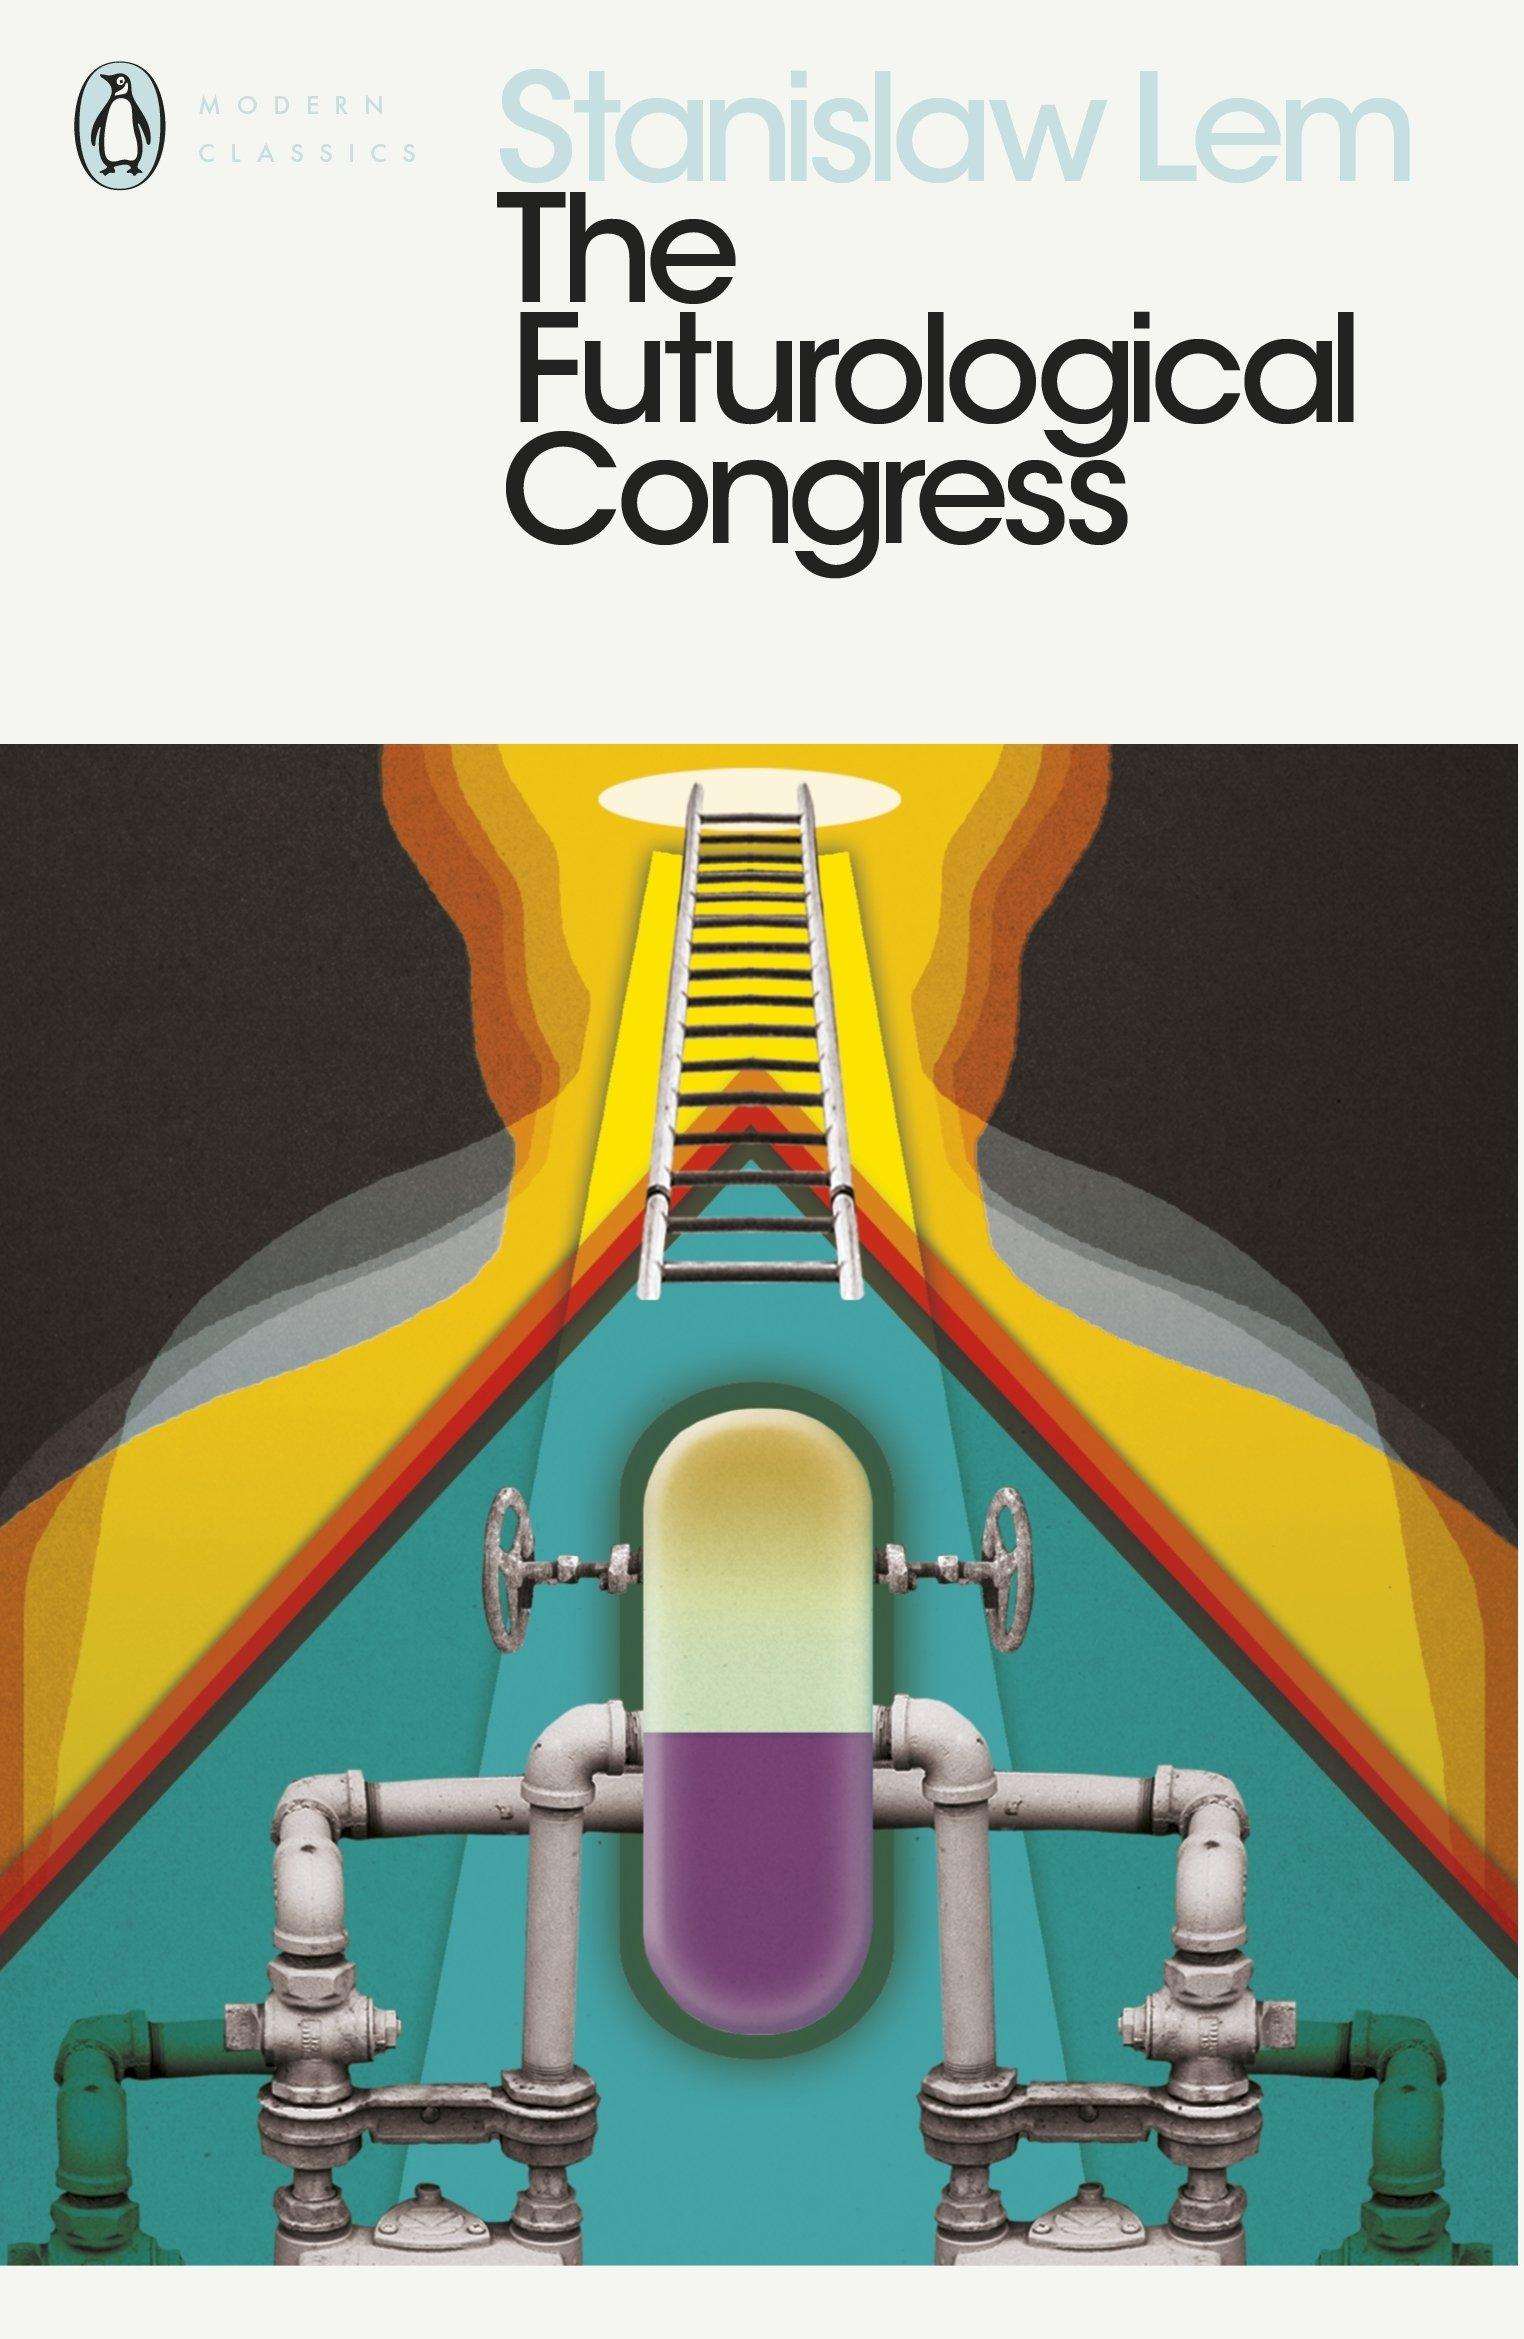 The Futurological Congress: Stanislaw Lem: 9780241312780: Books - Amazon.ca